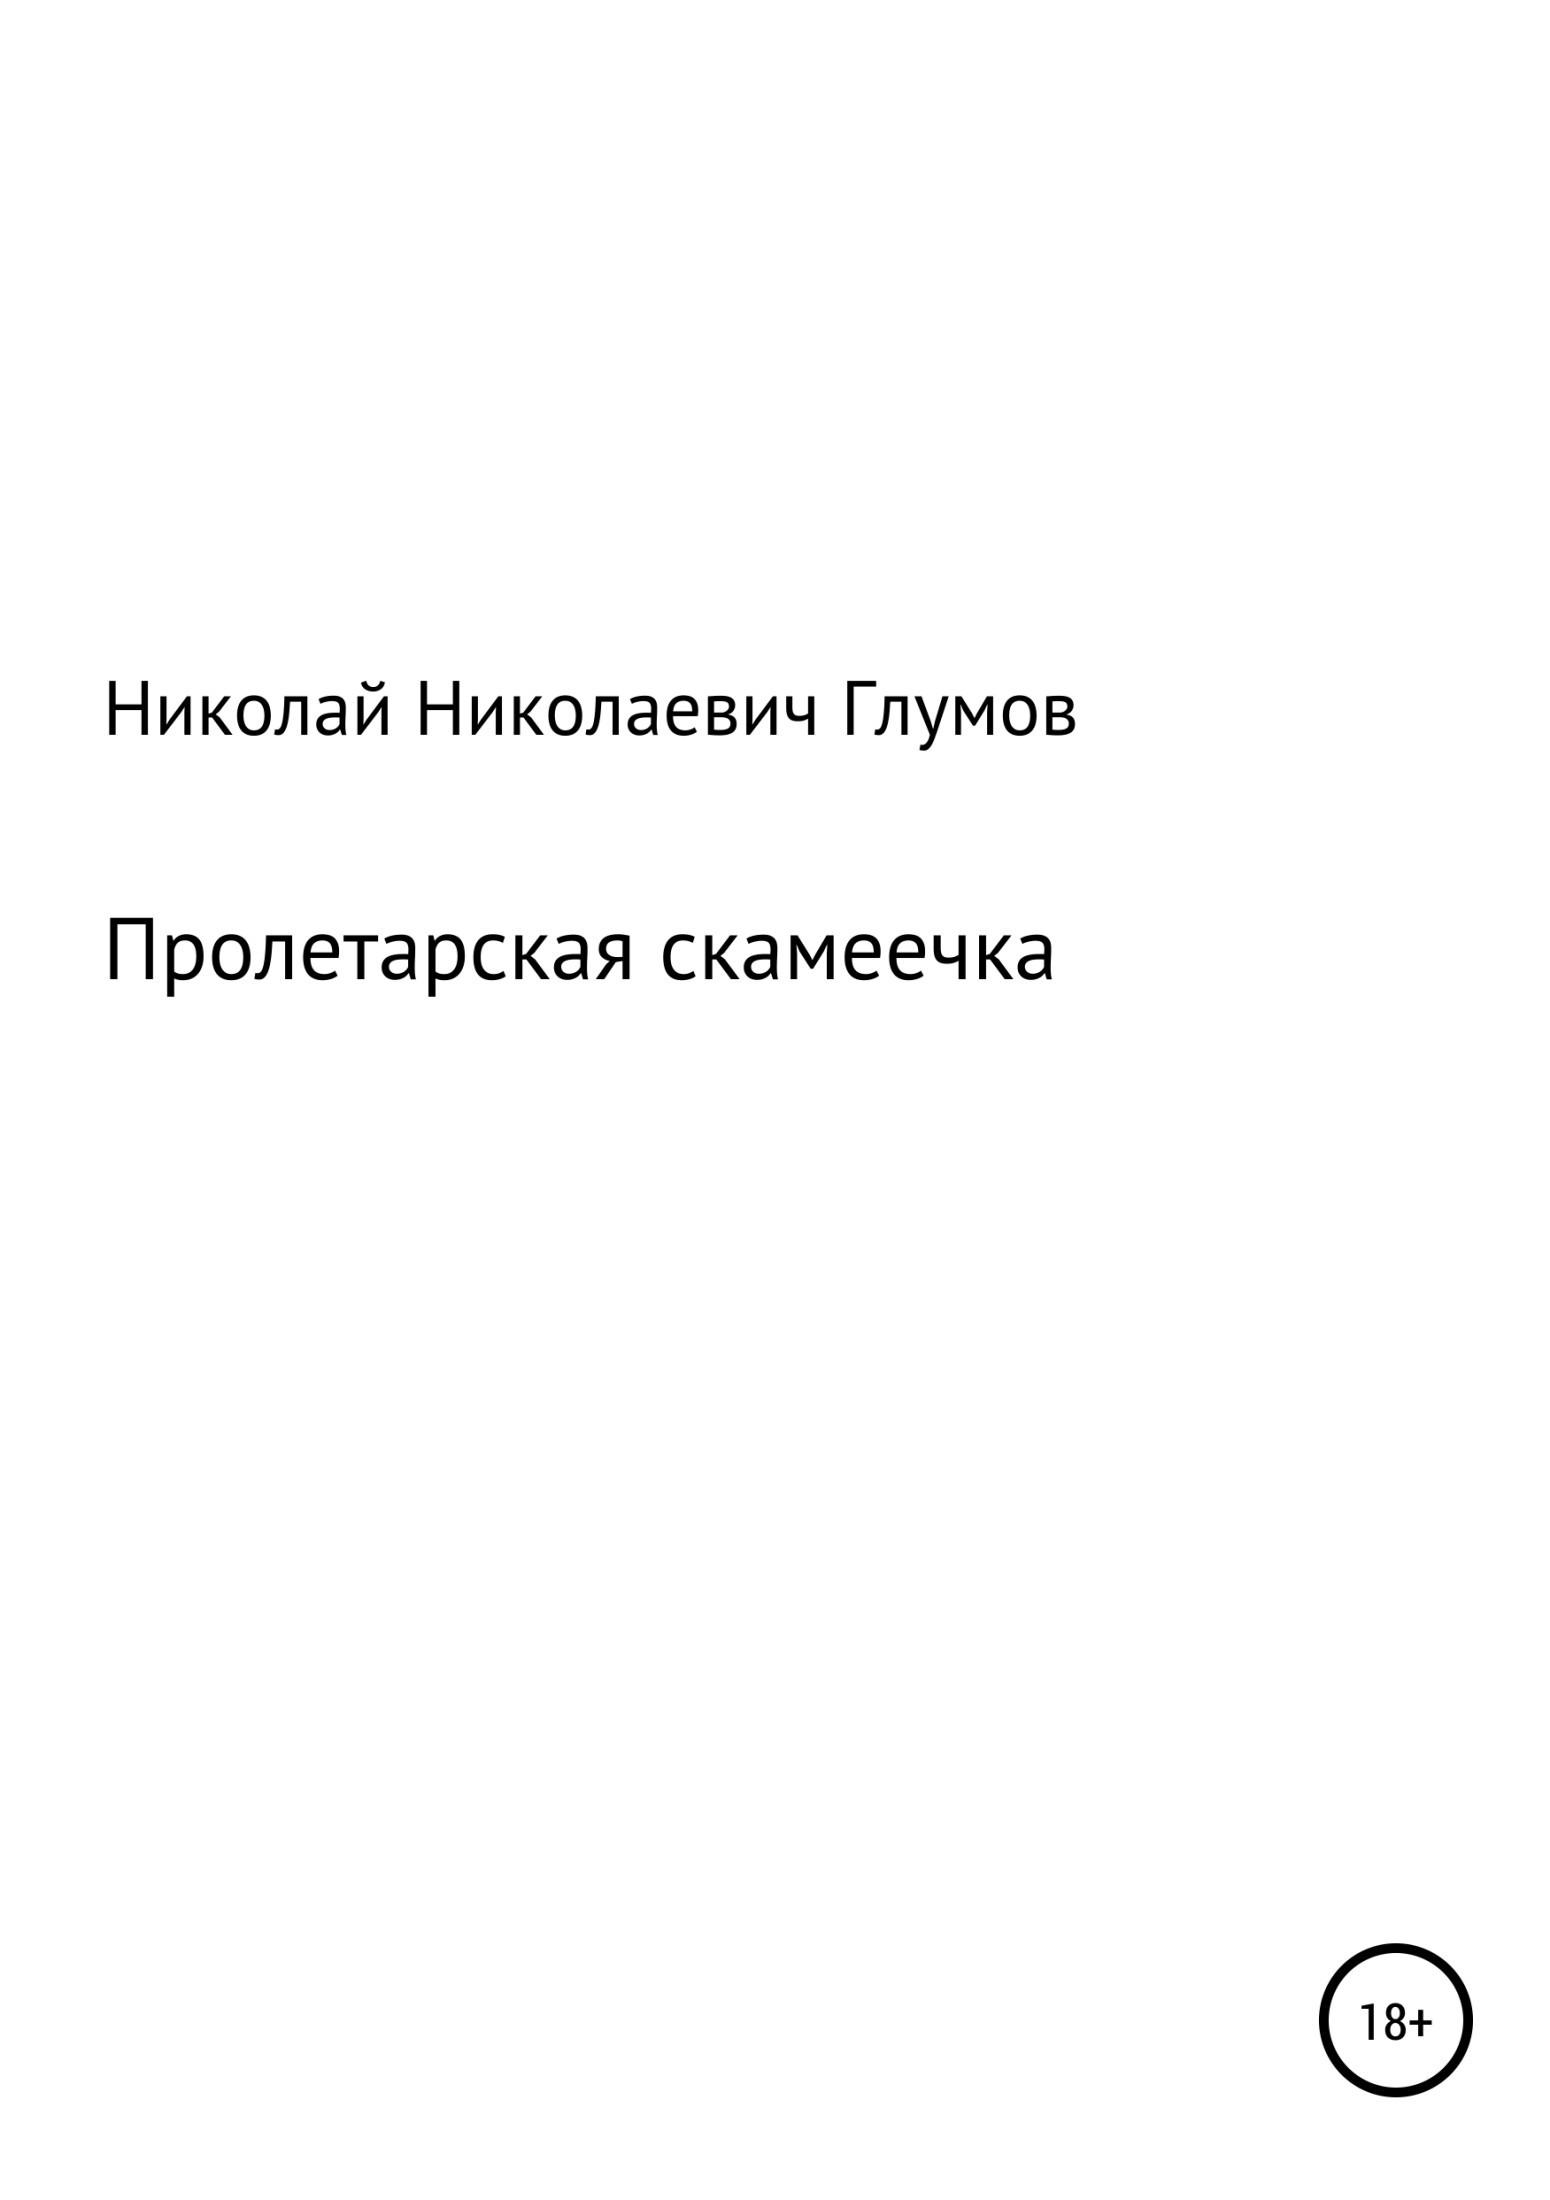 Николай Николаевич Глумов Пролетарская скамеечка николай николаевич глумов красный флаг над заводом